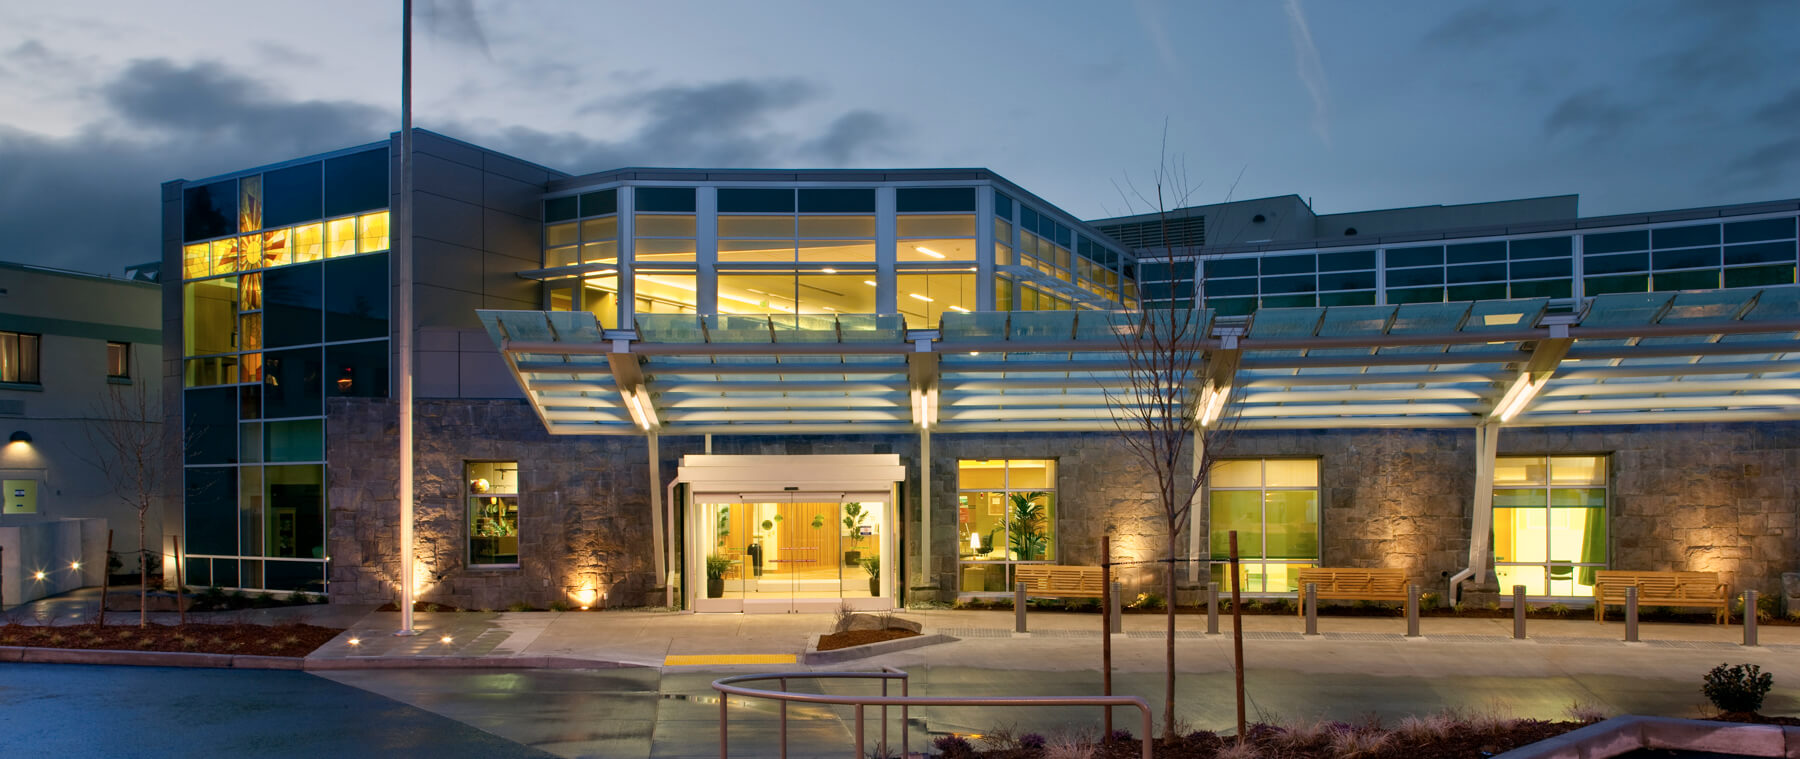 List of hospitals in Oregon - Wikipedia